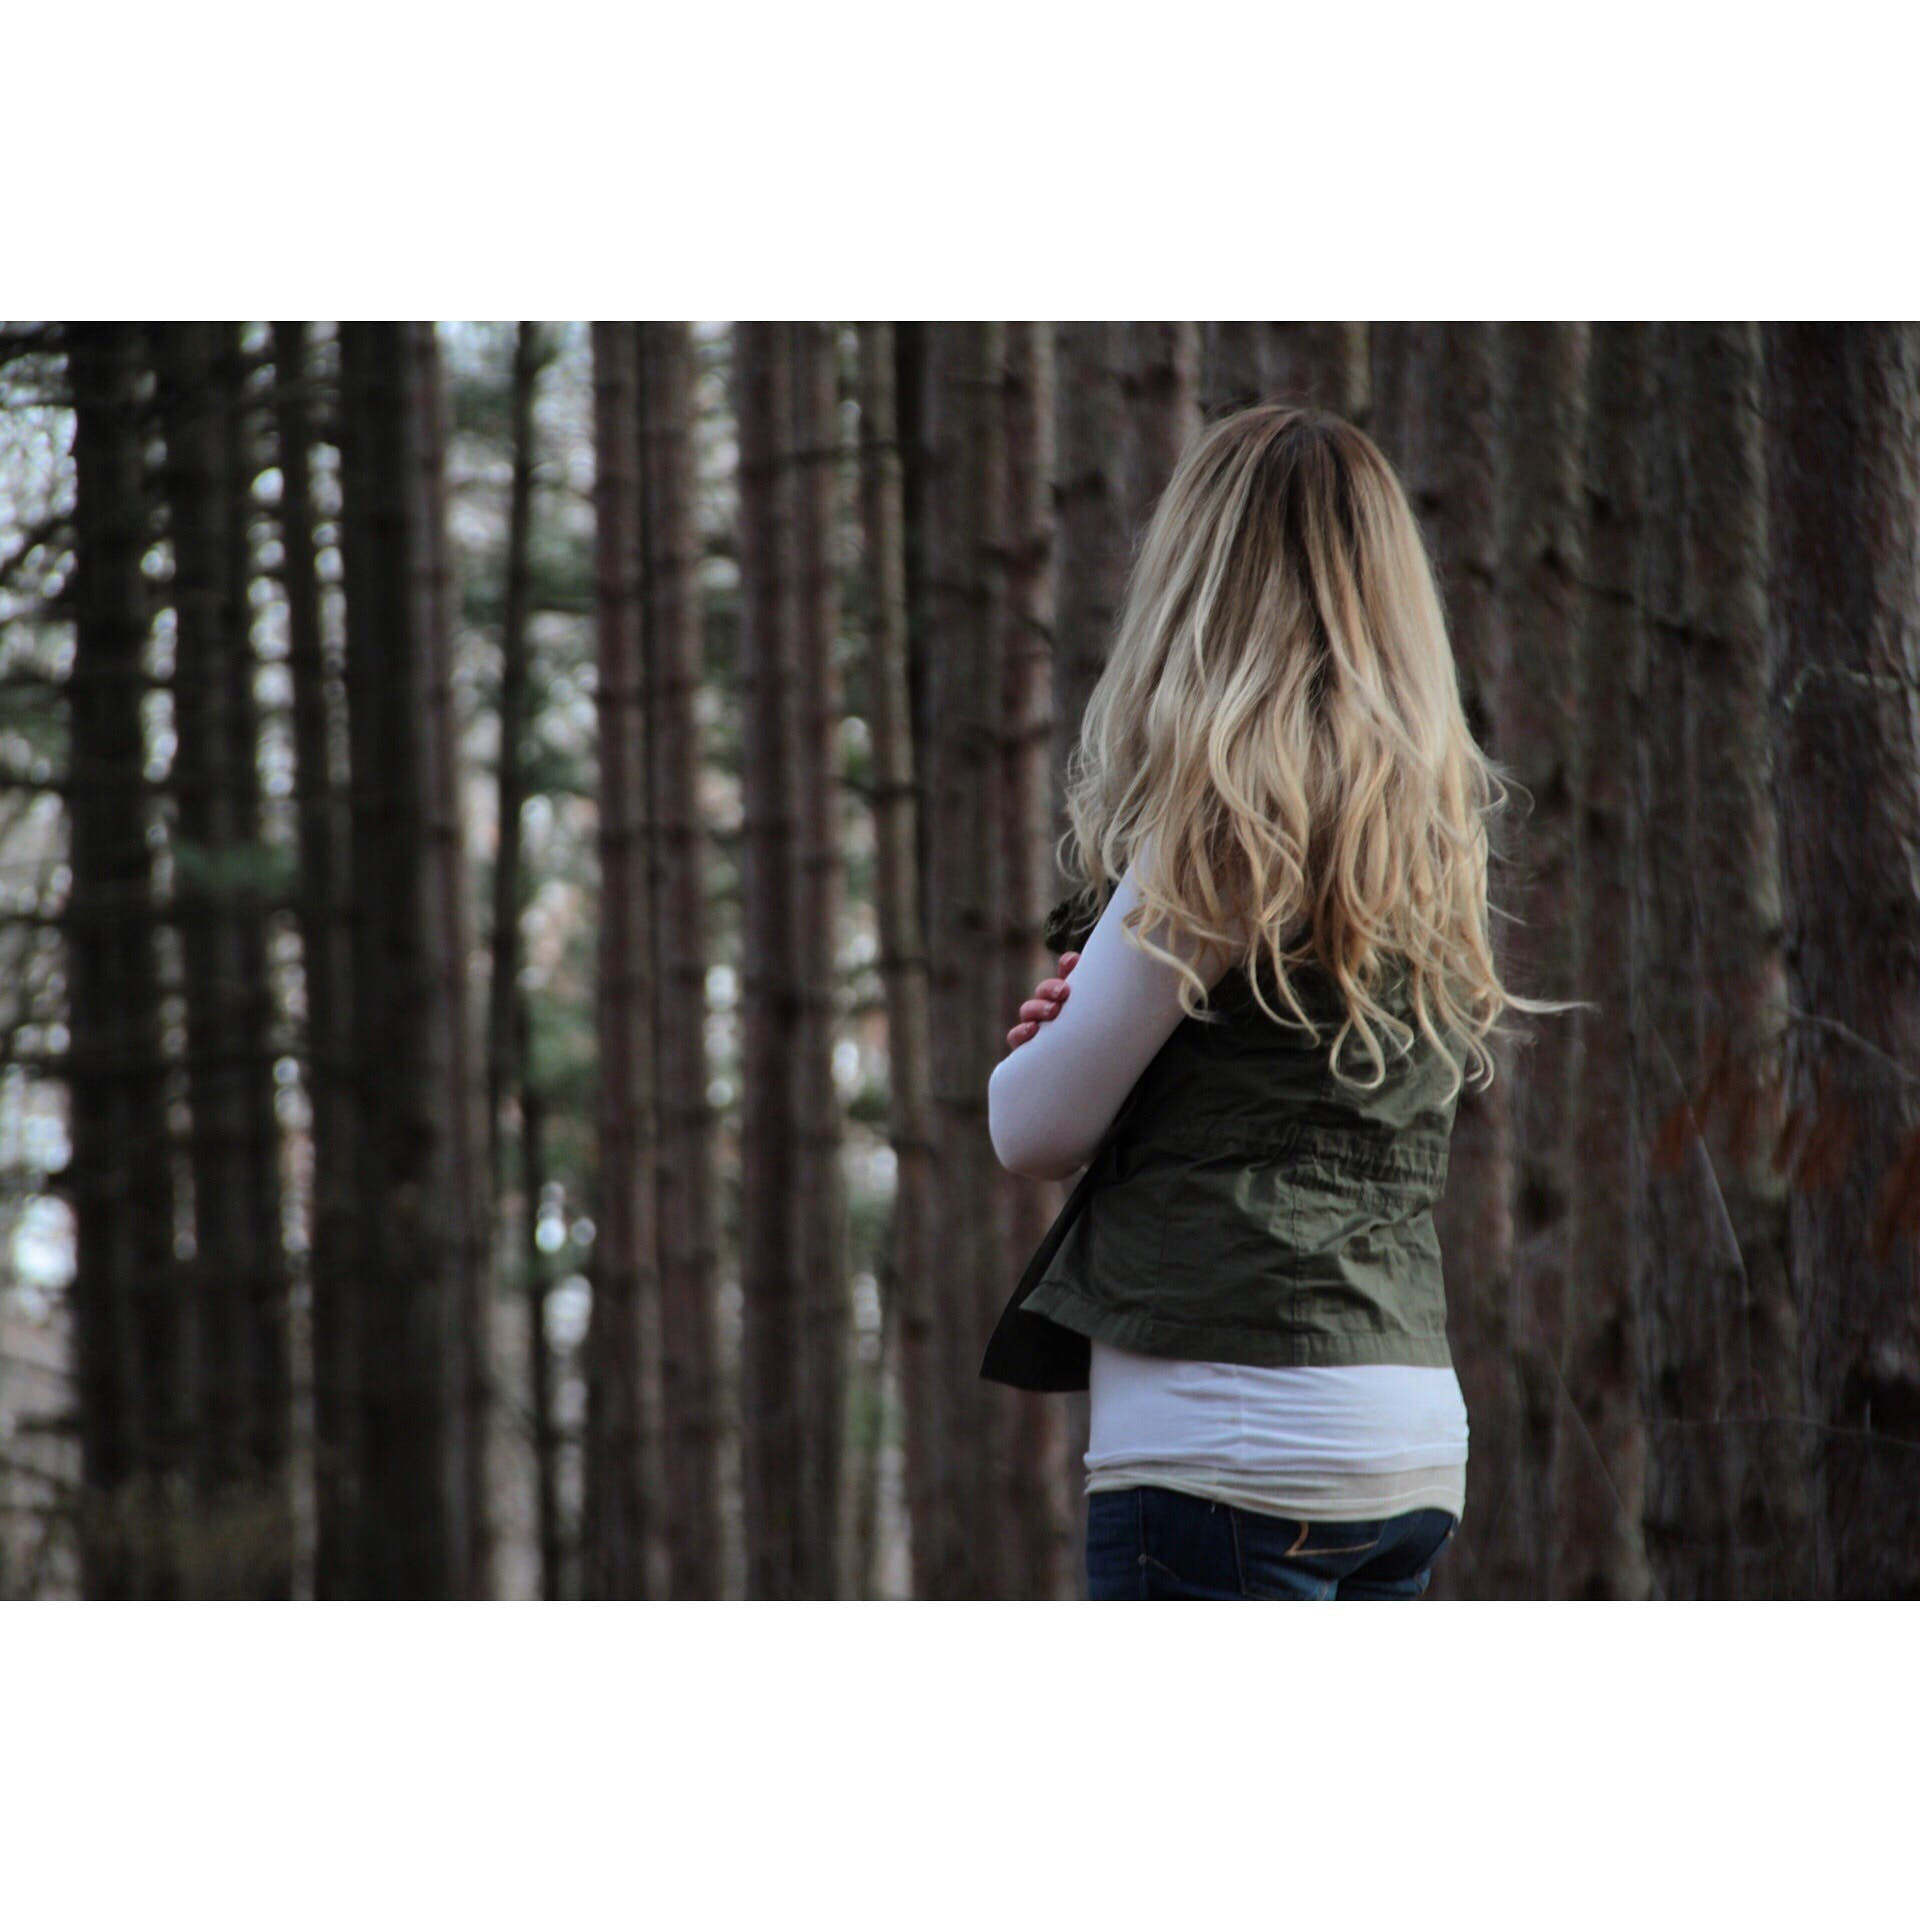 Безкоштовне стокове фото на тему «блондинка, волосина, Дівчина, дерева»